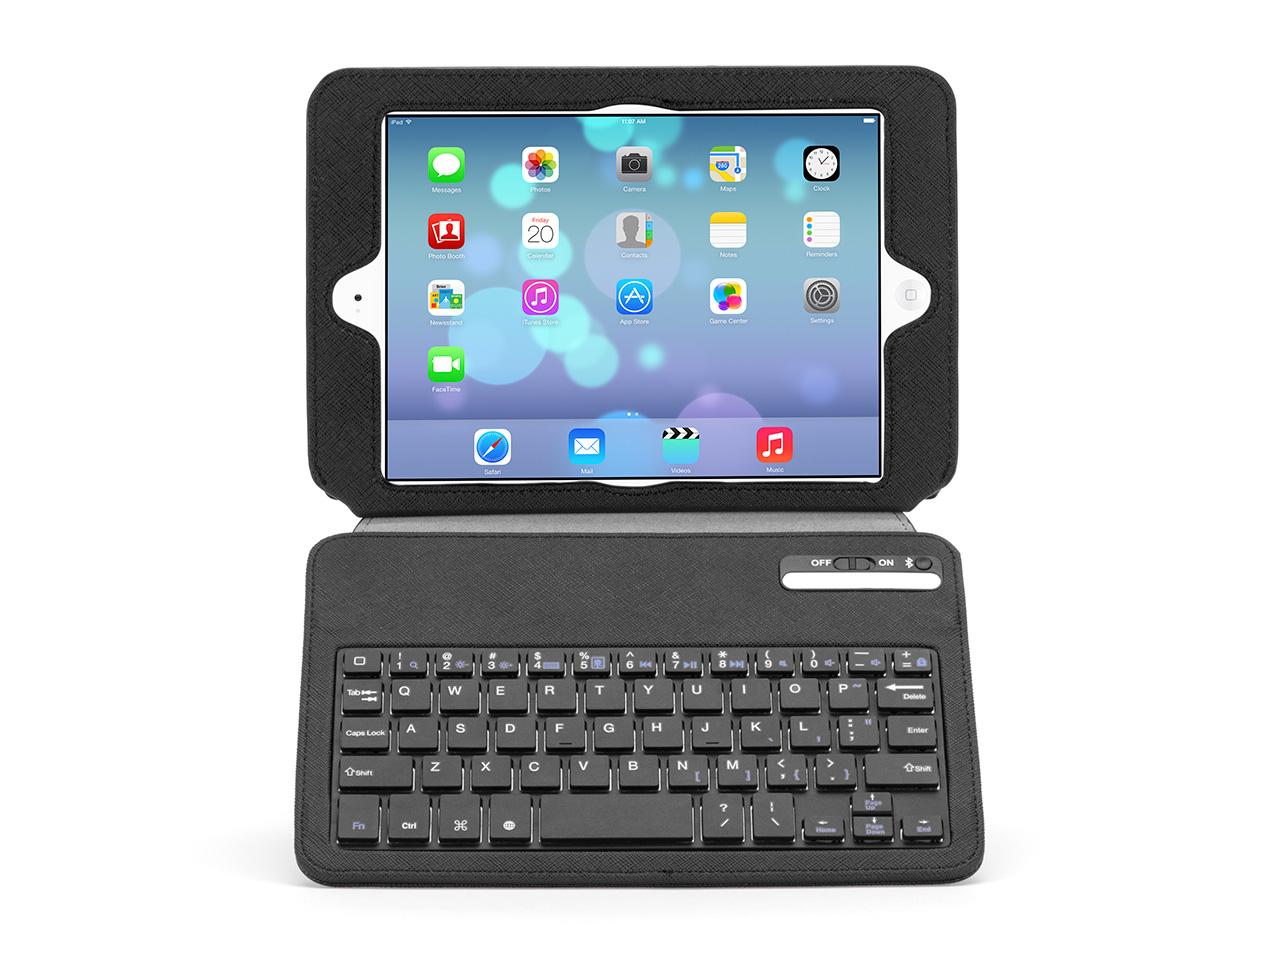 slim keyboard folio for ipad mini and ipad mini with. Black Bedroom Furniture Sets. Home Design Ideas